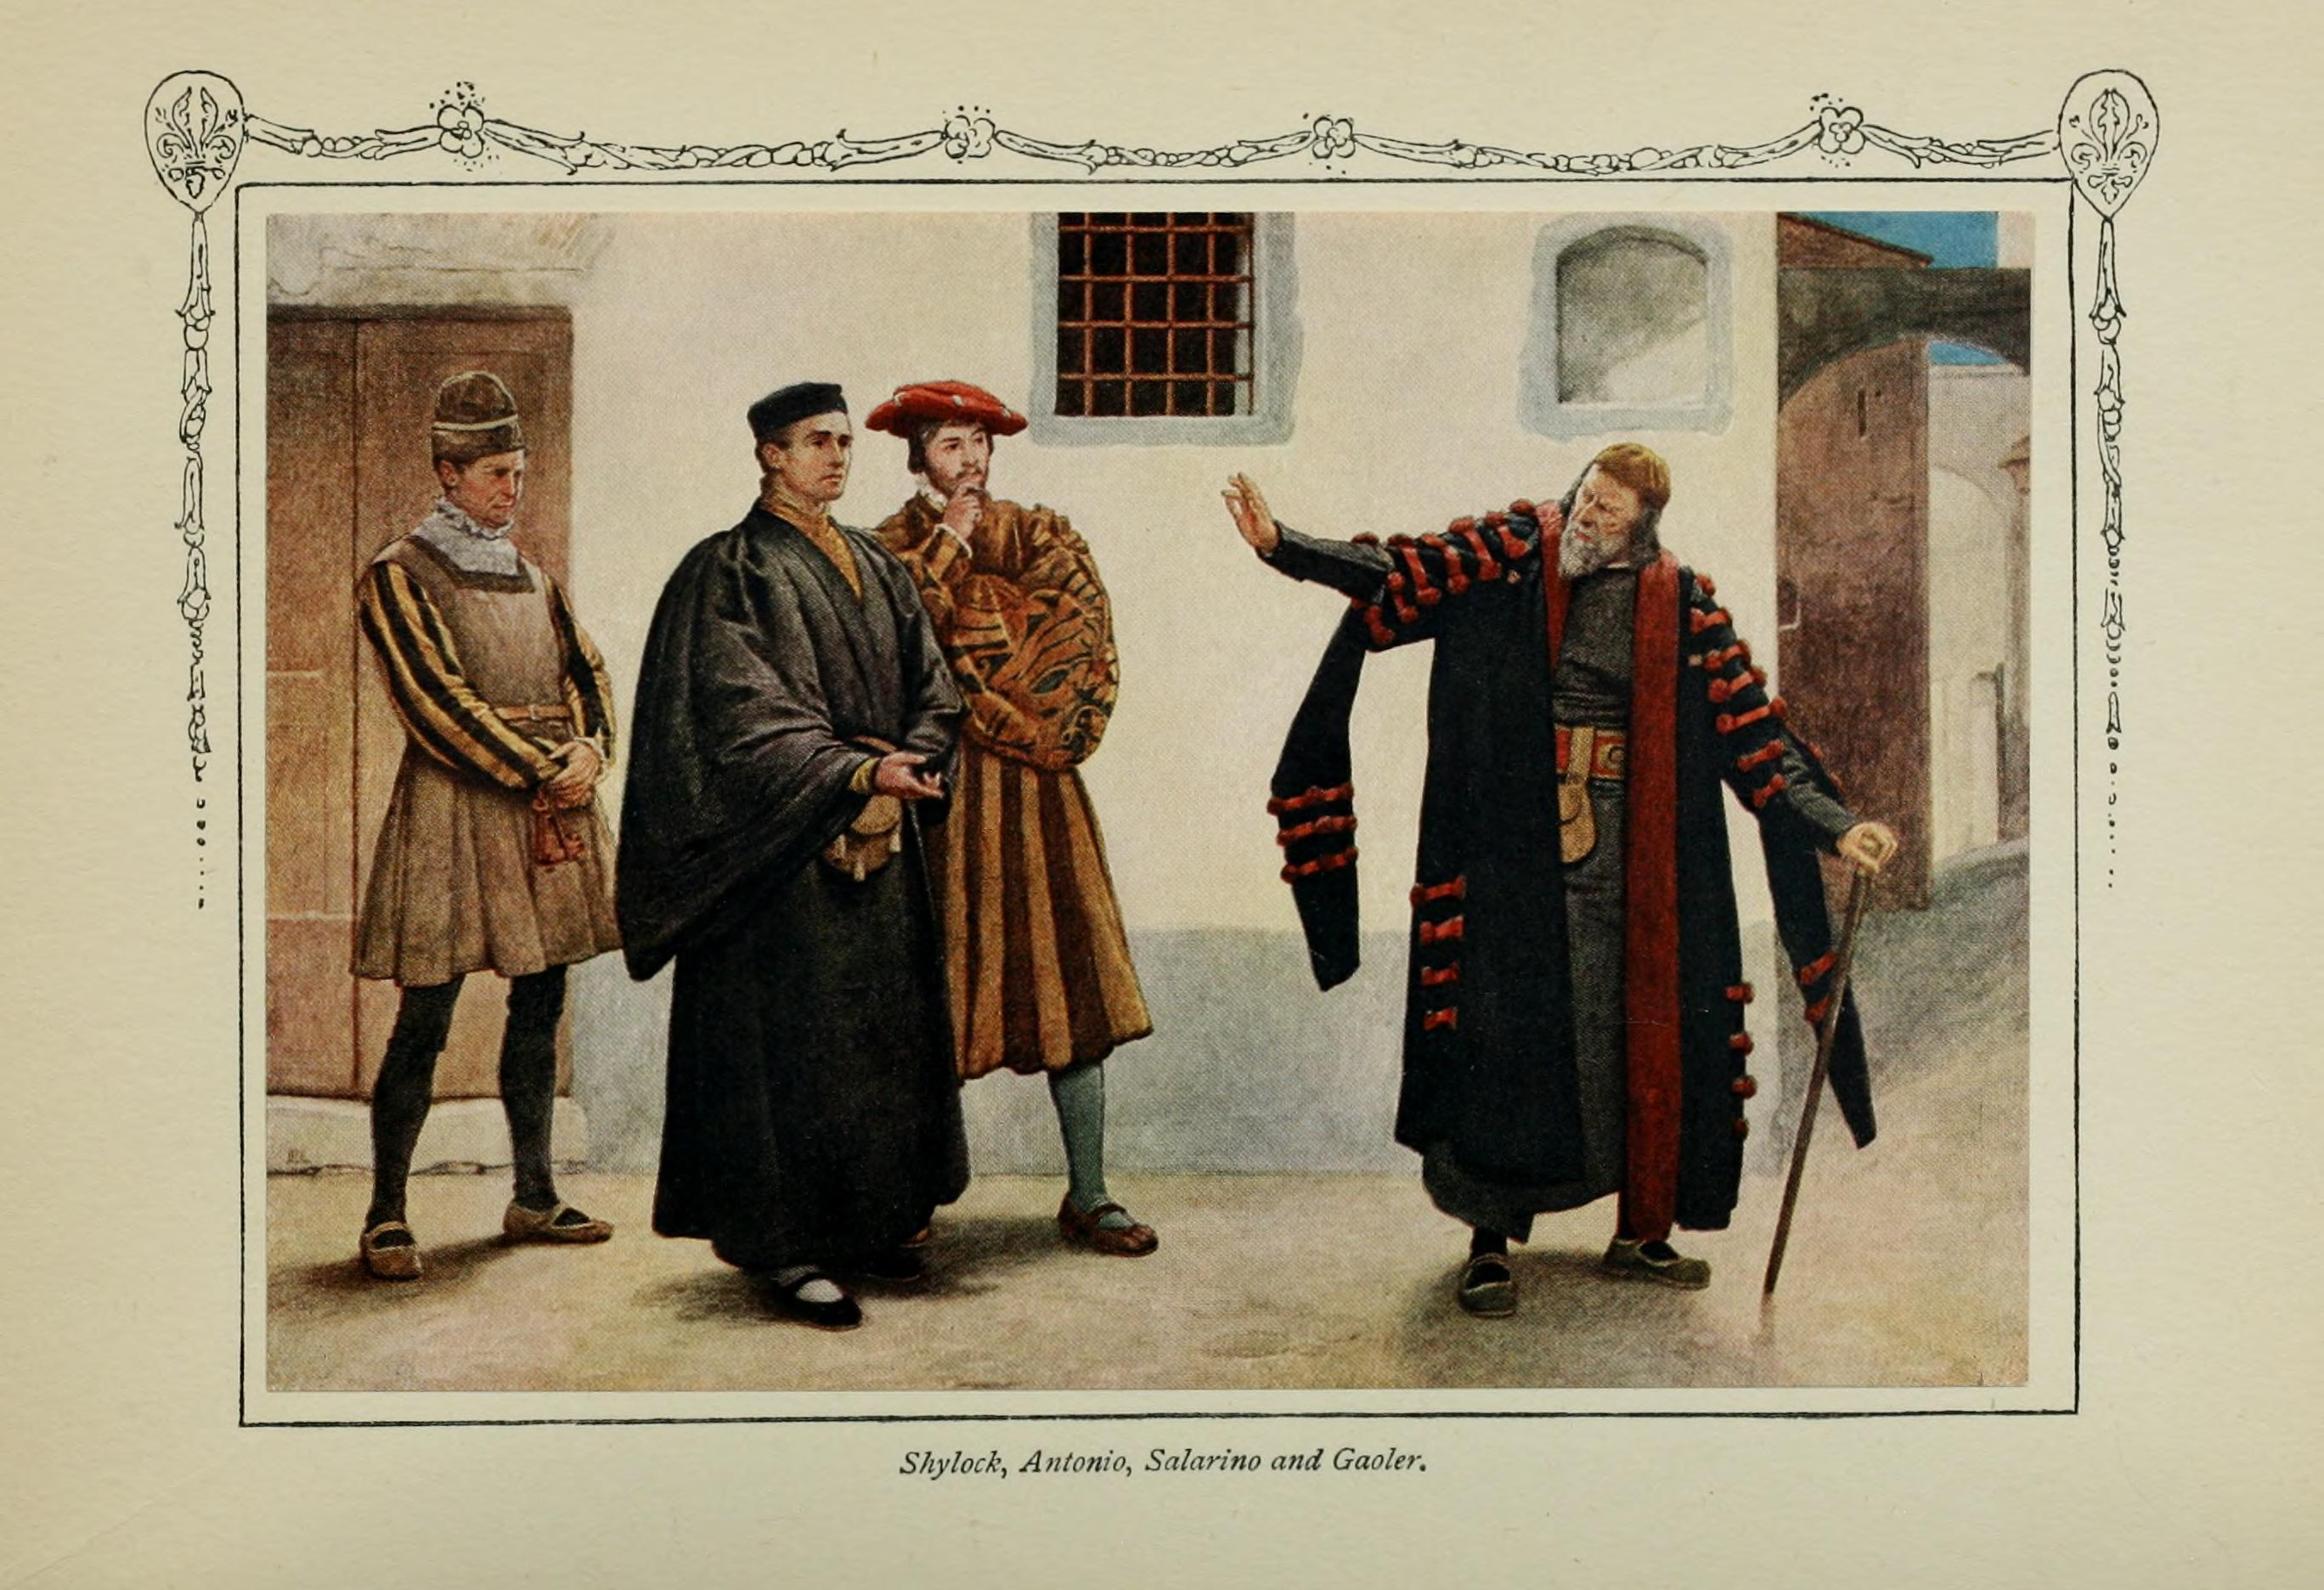 Shylock Is The Villian In Shakespeare's Merchant Of Venice